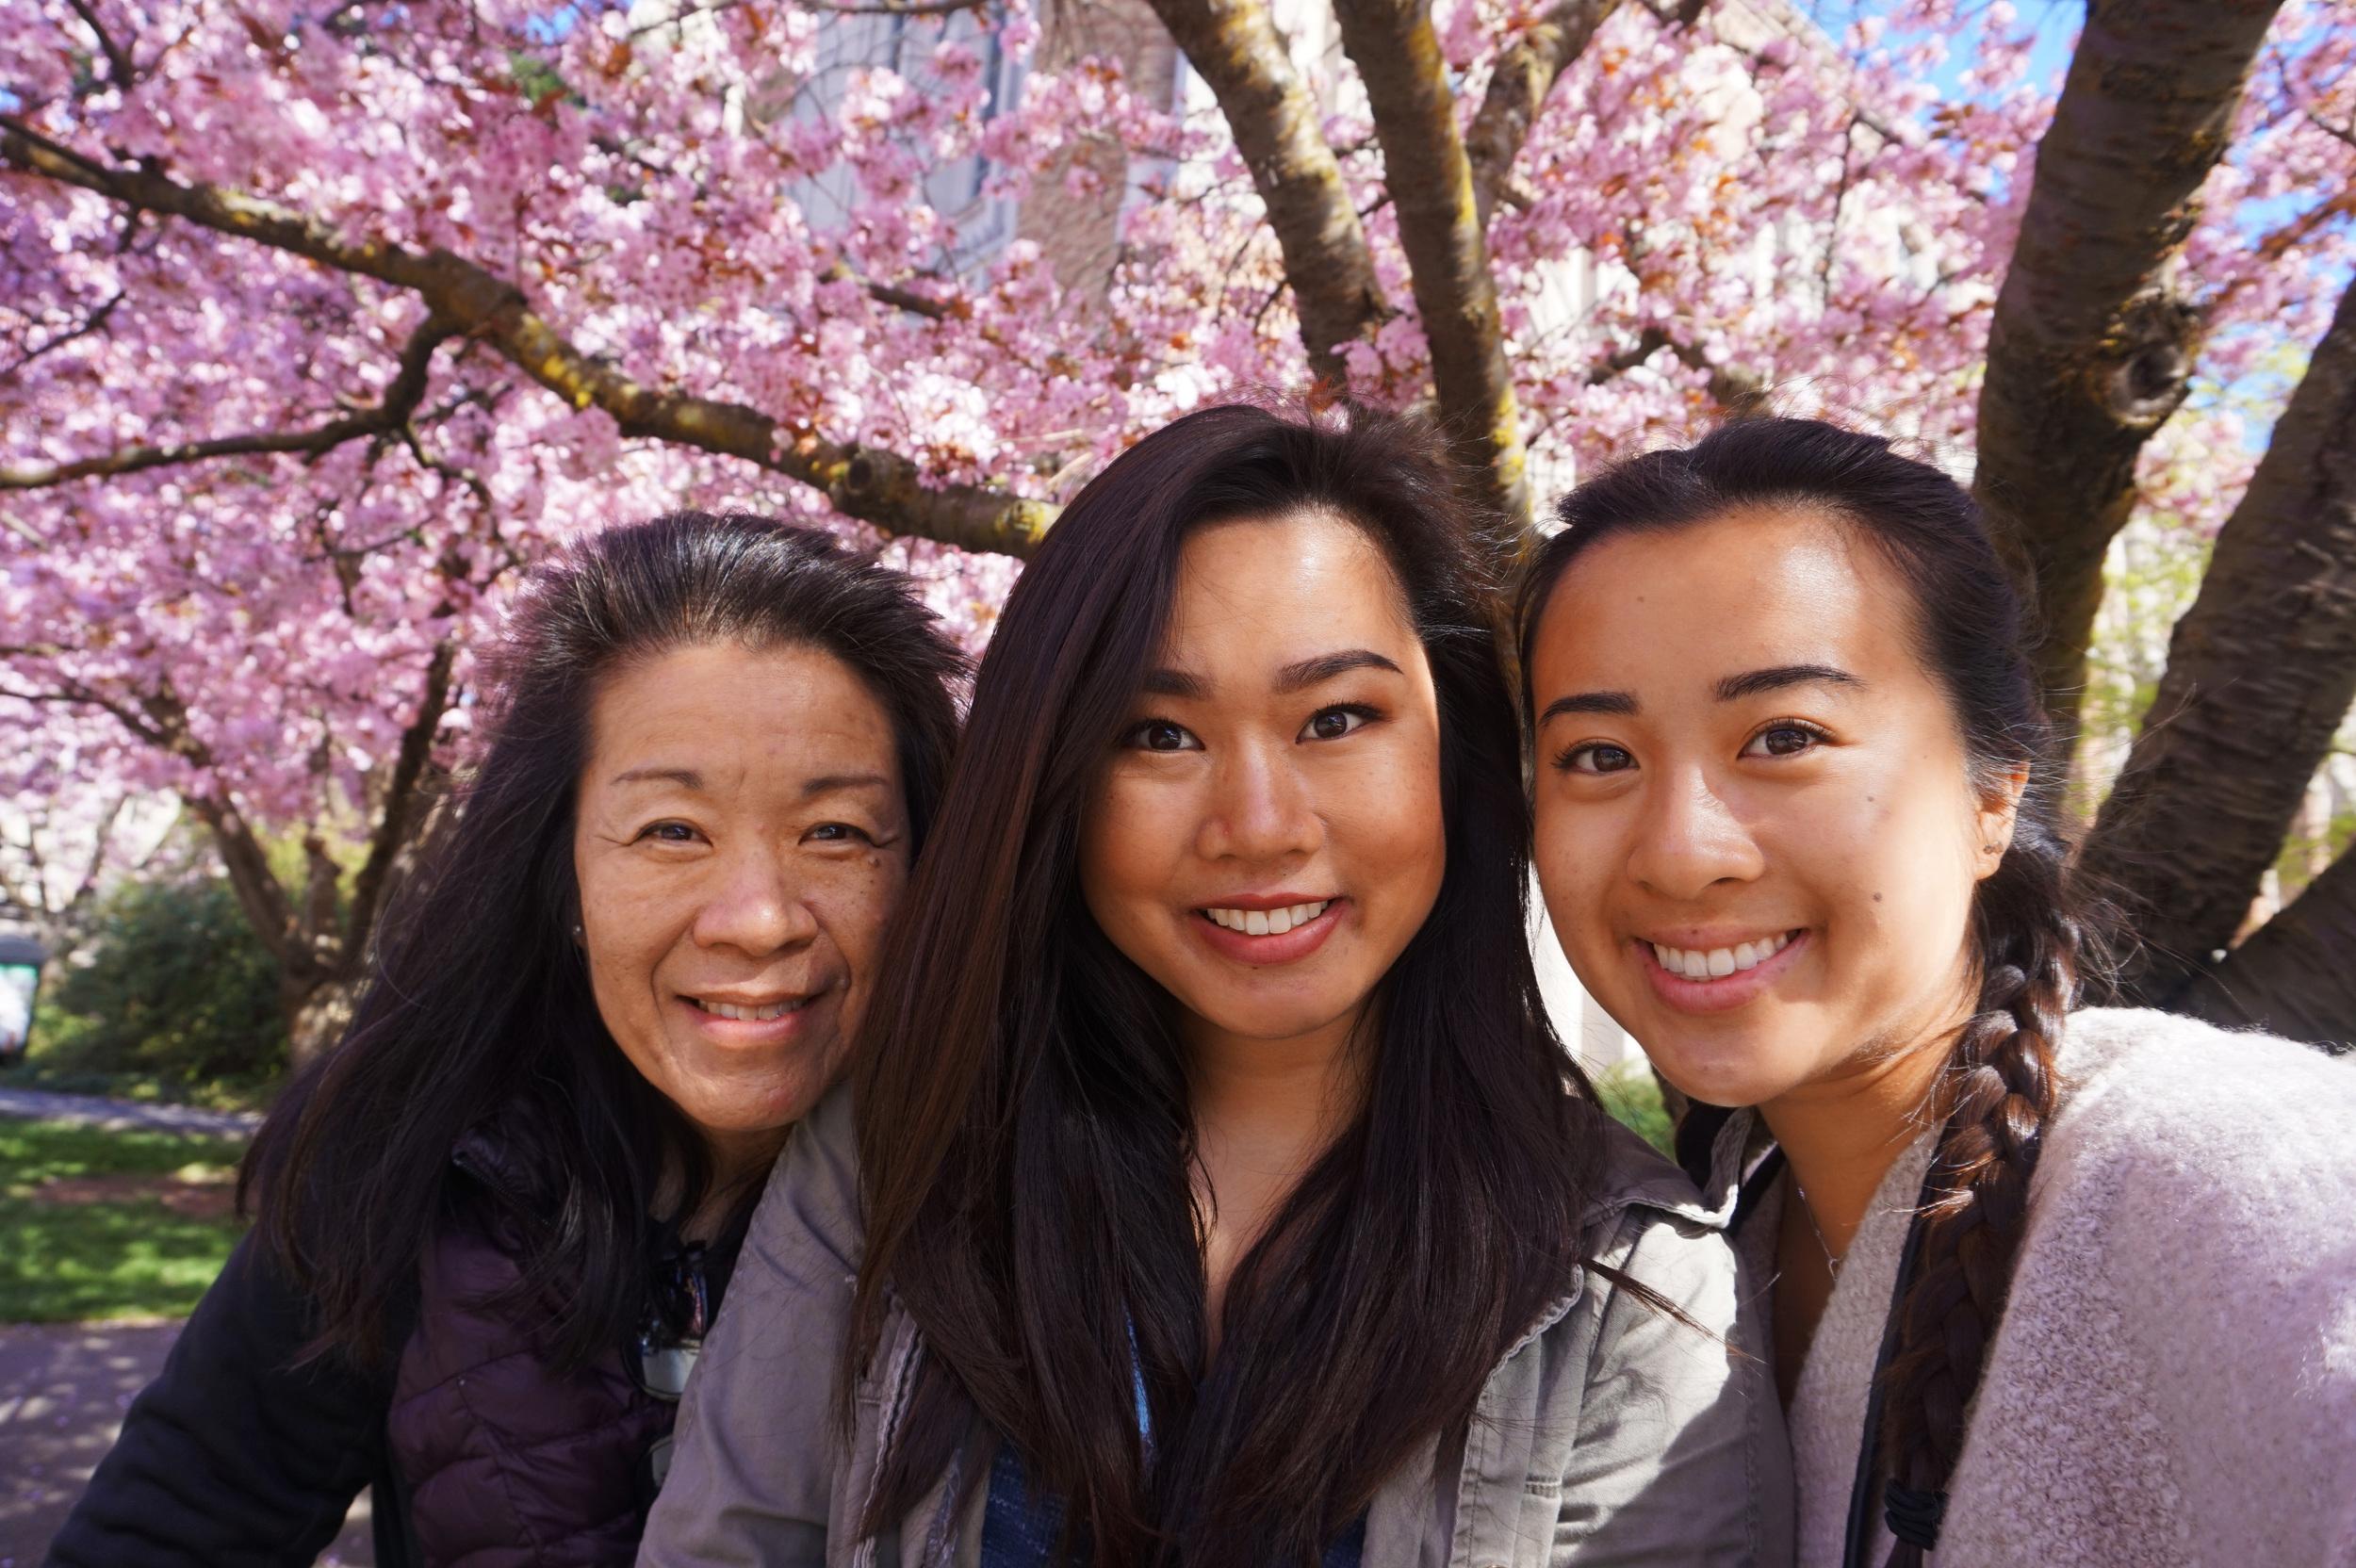 Triplets?